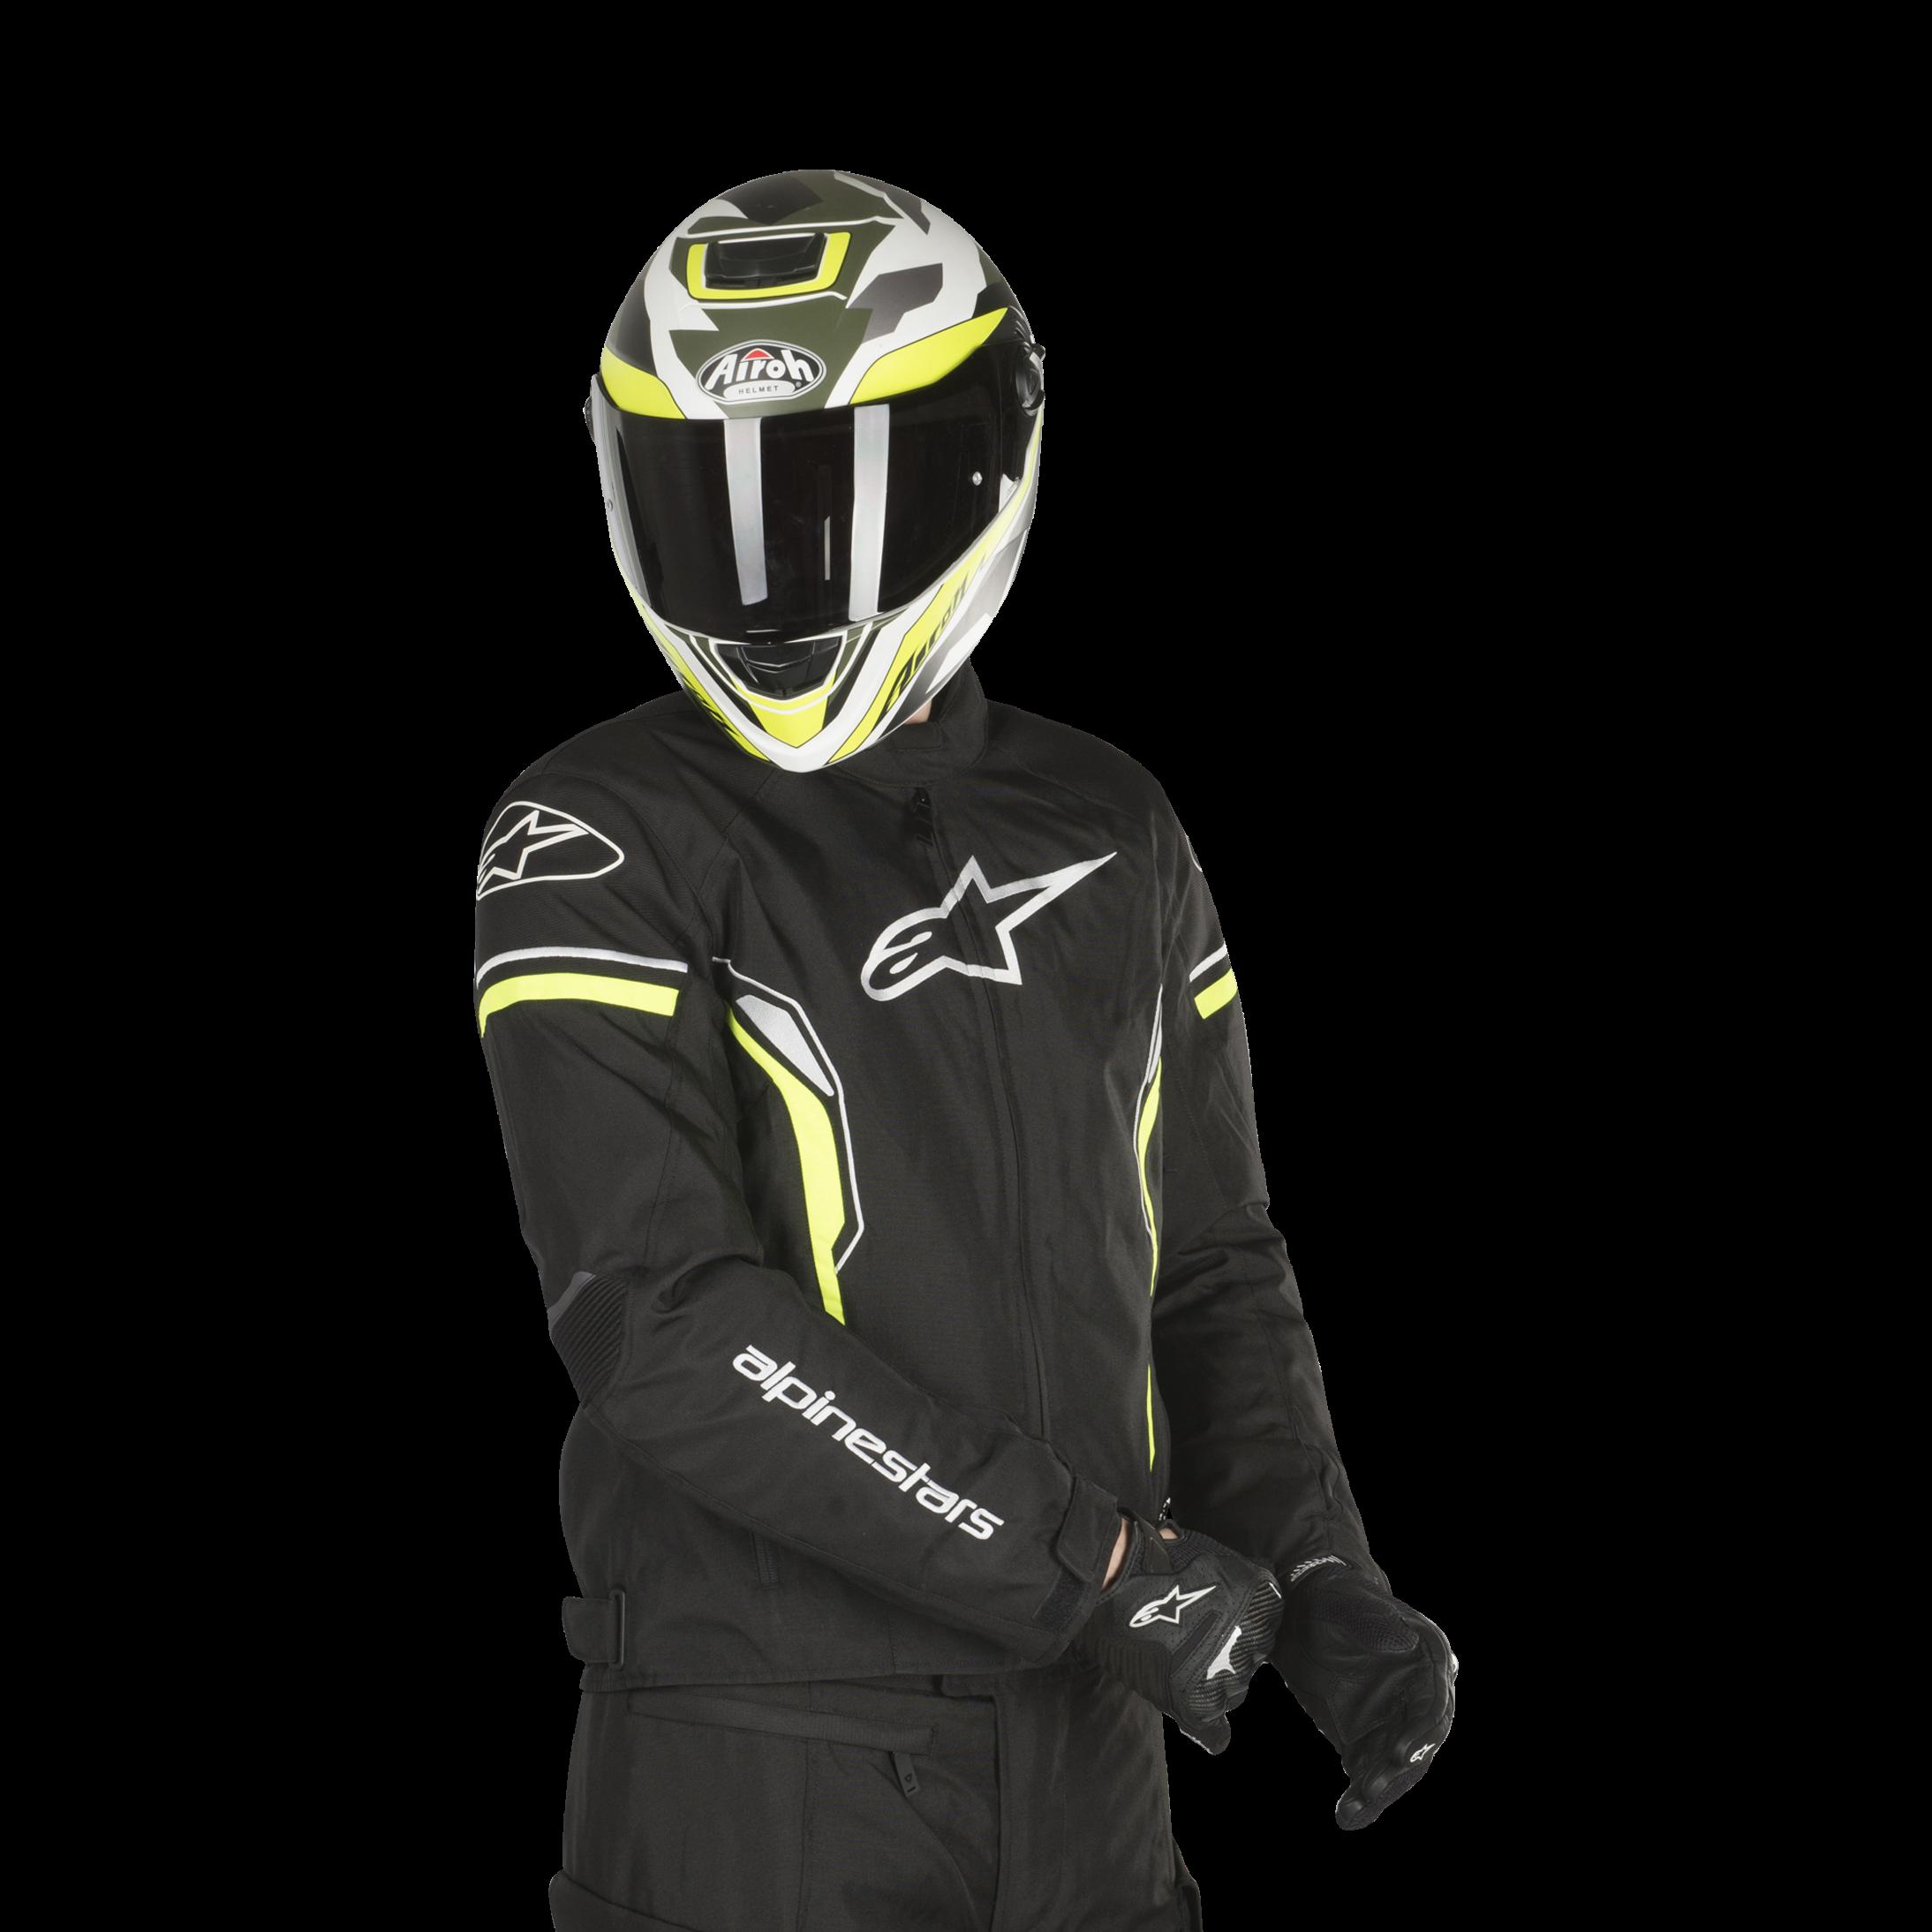 amarillo ne/ón color negro talla XXL Alpinestars Chaqueta de motorista T-sp-1 impermeable